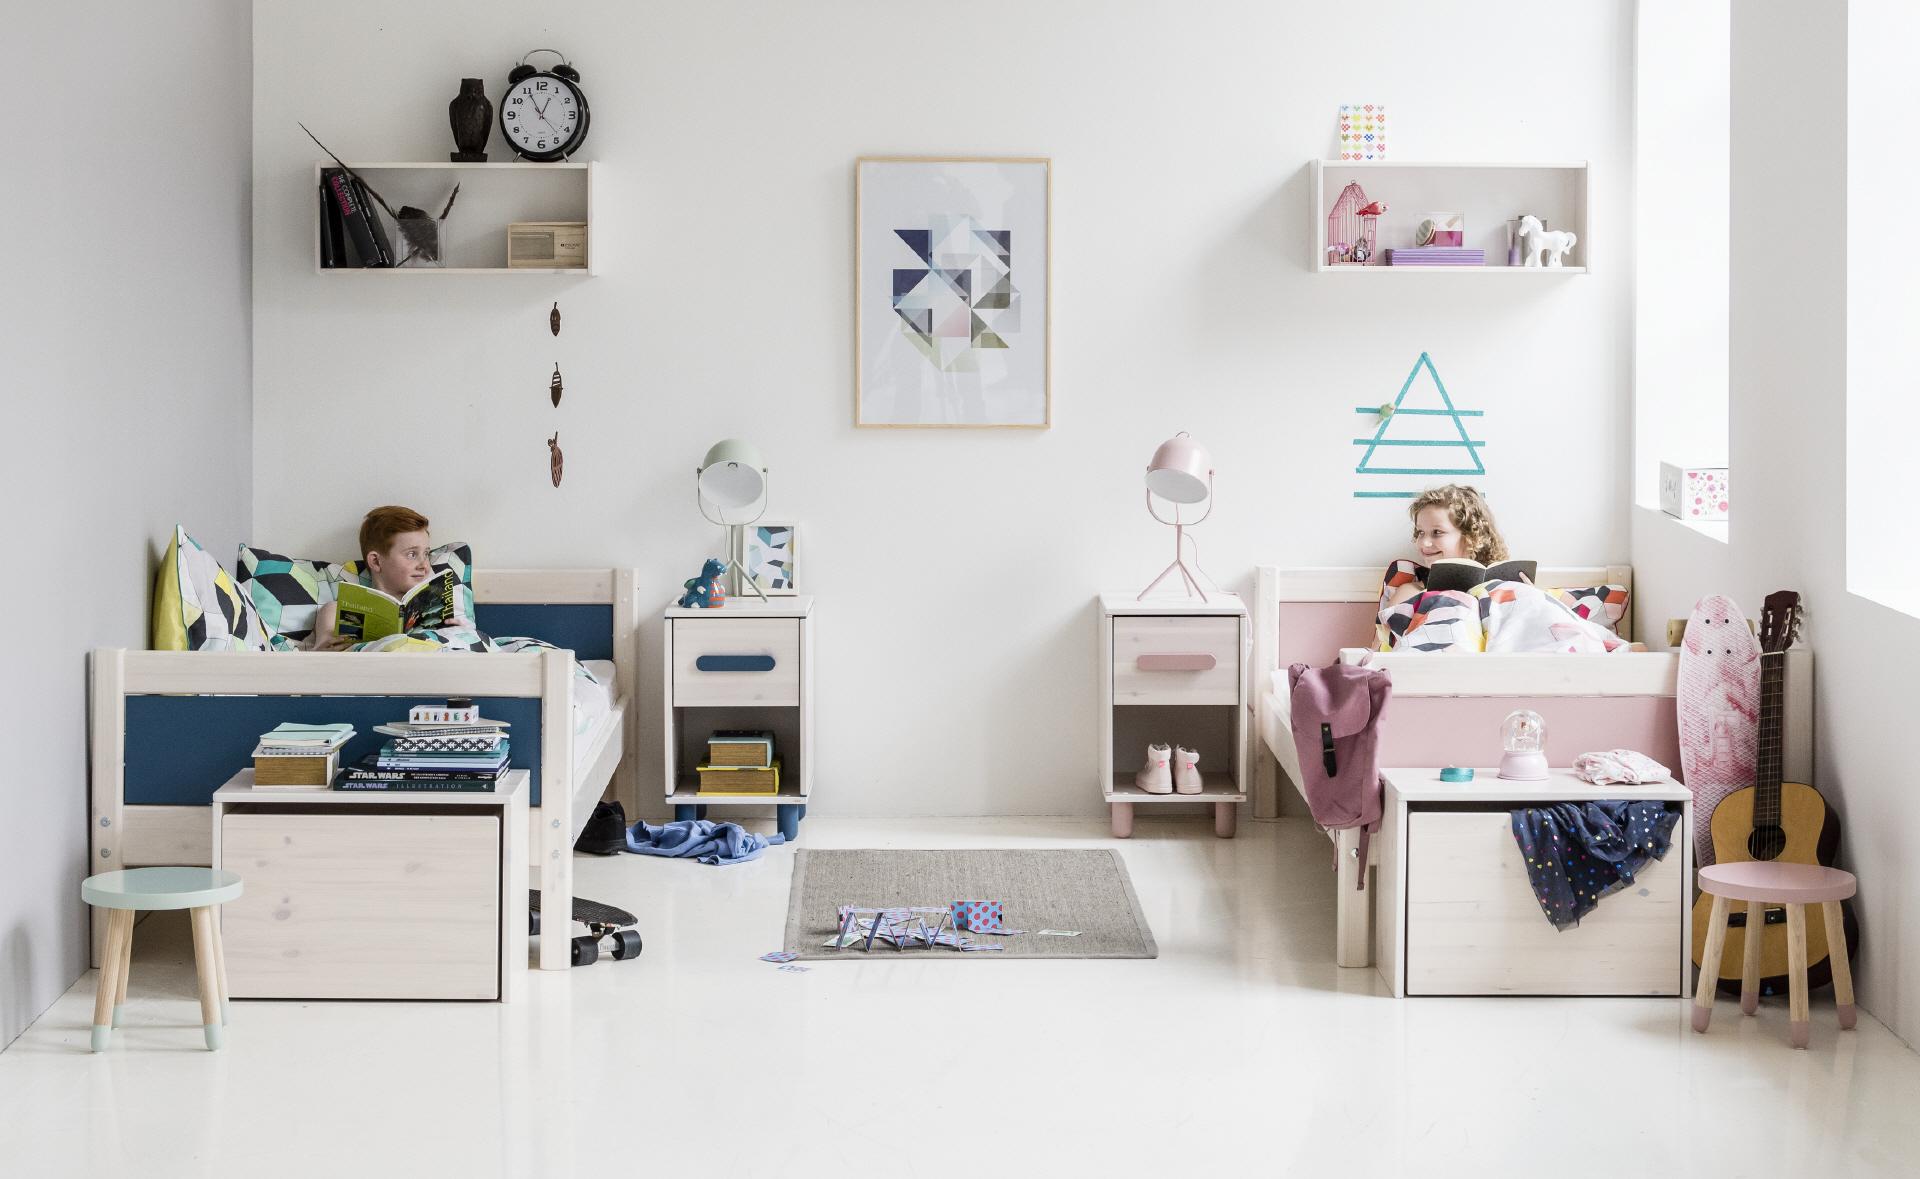 Hochbett design kinder  FLEXA Shop - Online Shop für Flexa Möbel by Möbel-Kiste